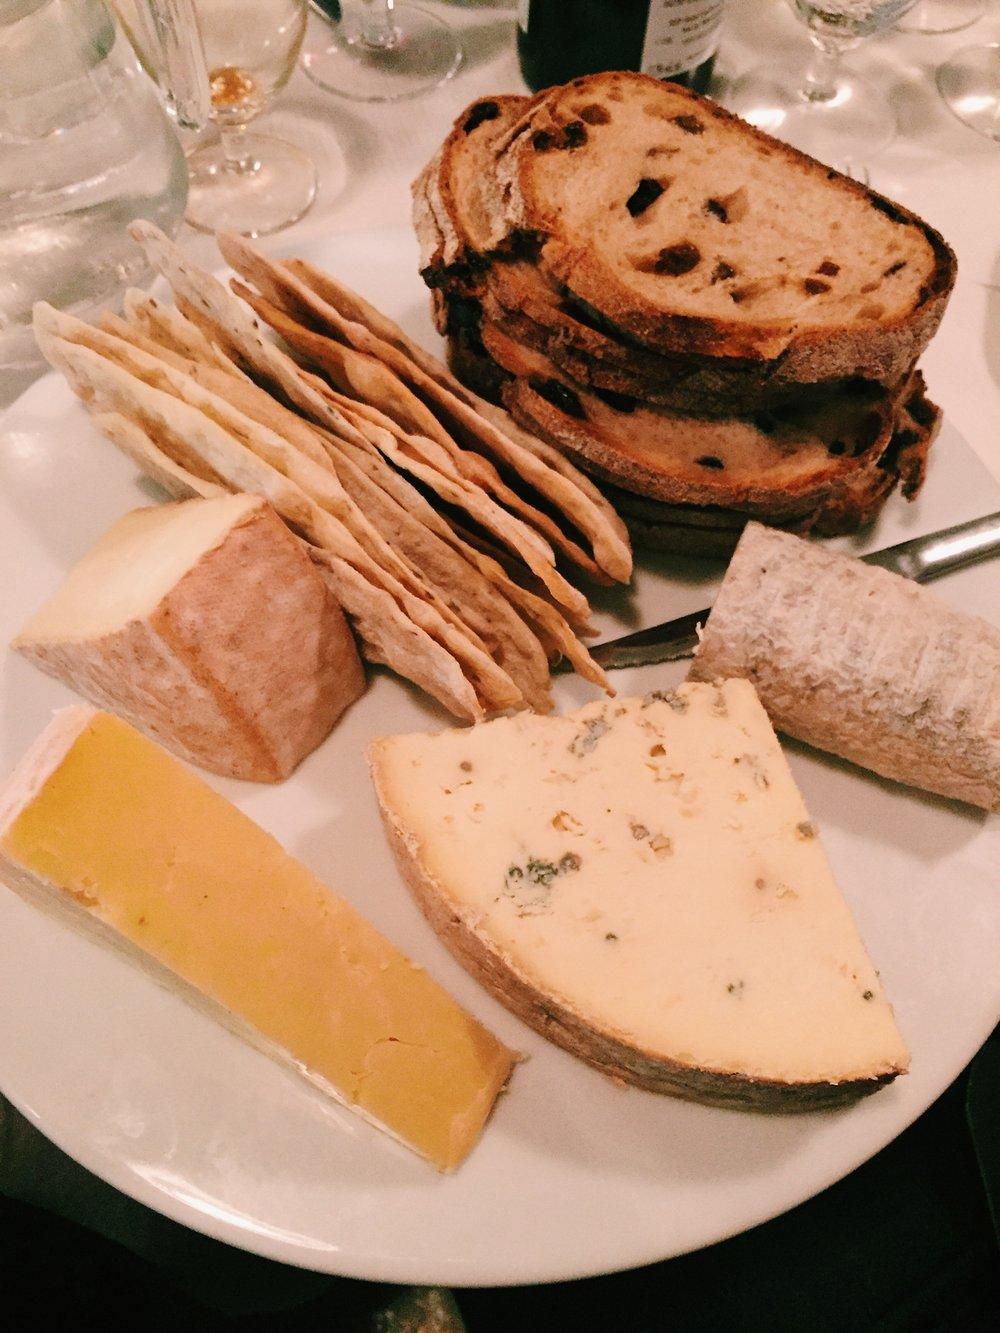 Neal's Yard Dairy Cheeses